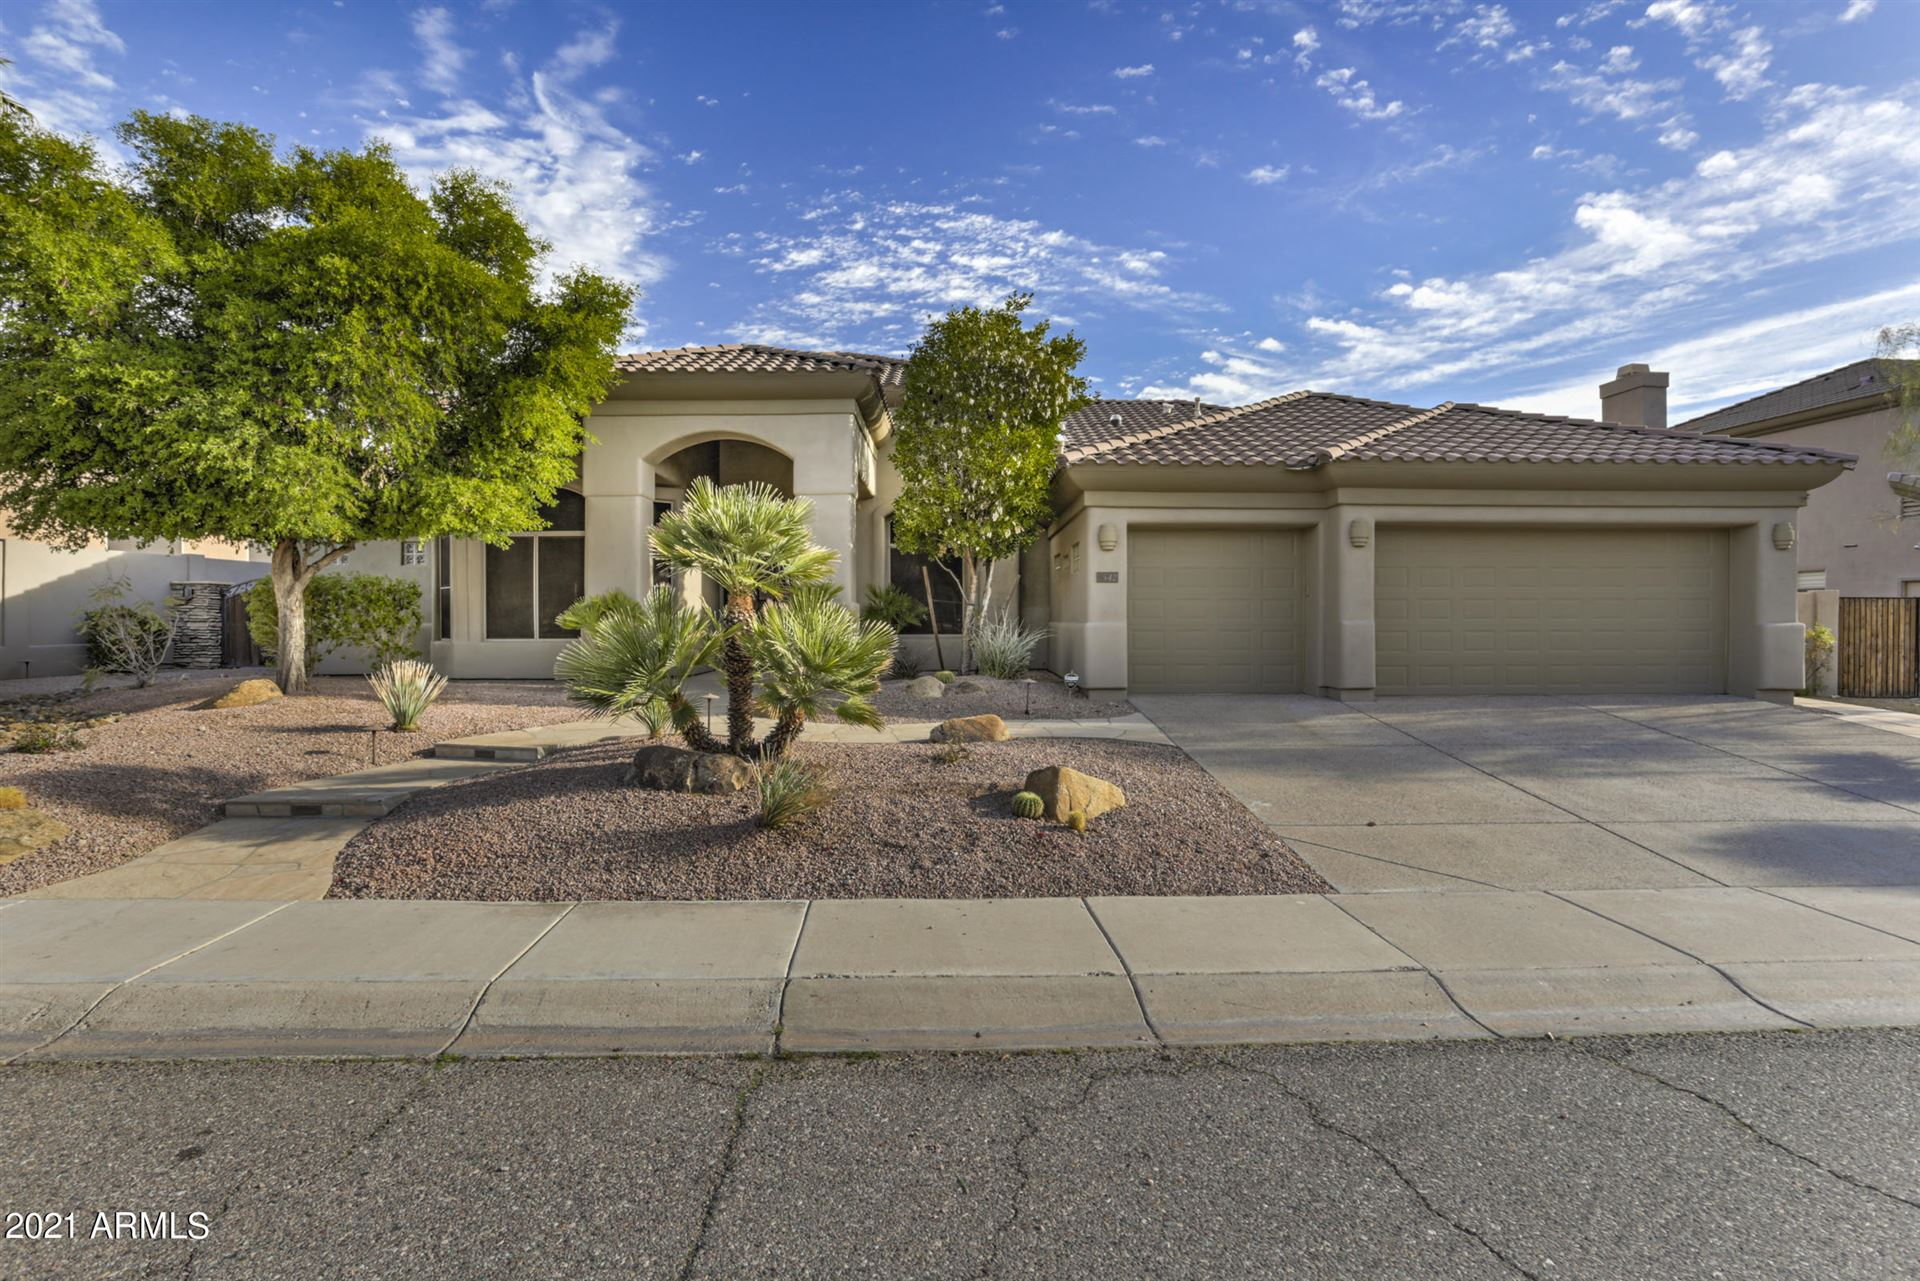 1542 W SALTSAGE Drive, Phoenix, AZ 85045 - MLS#: 6195388